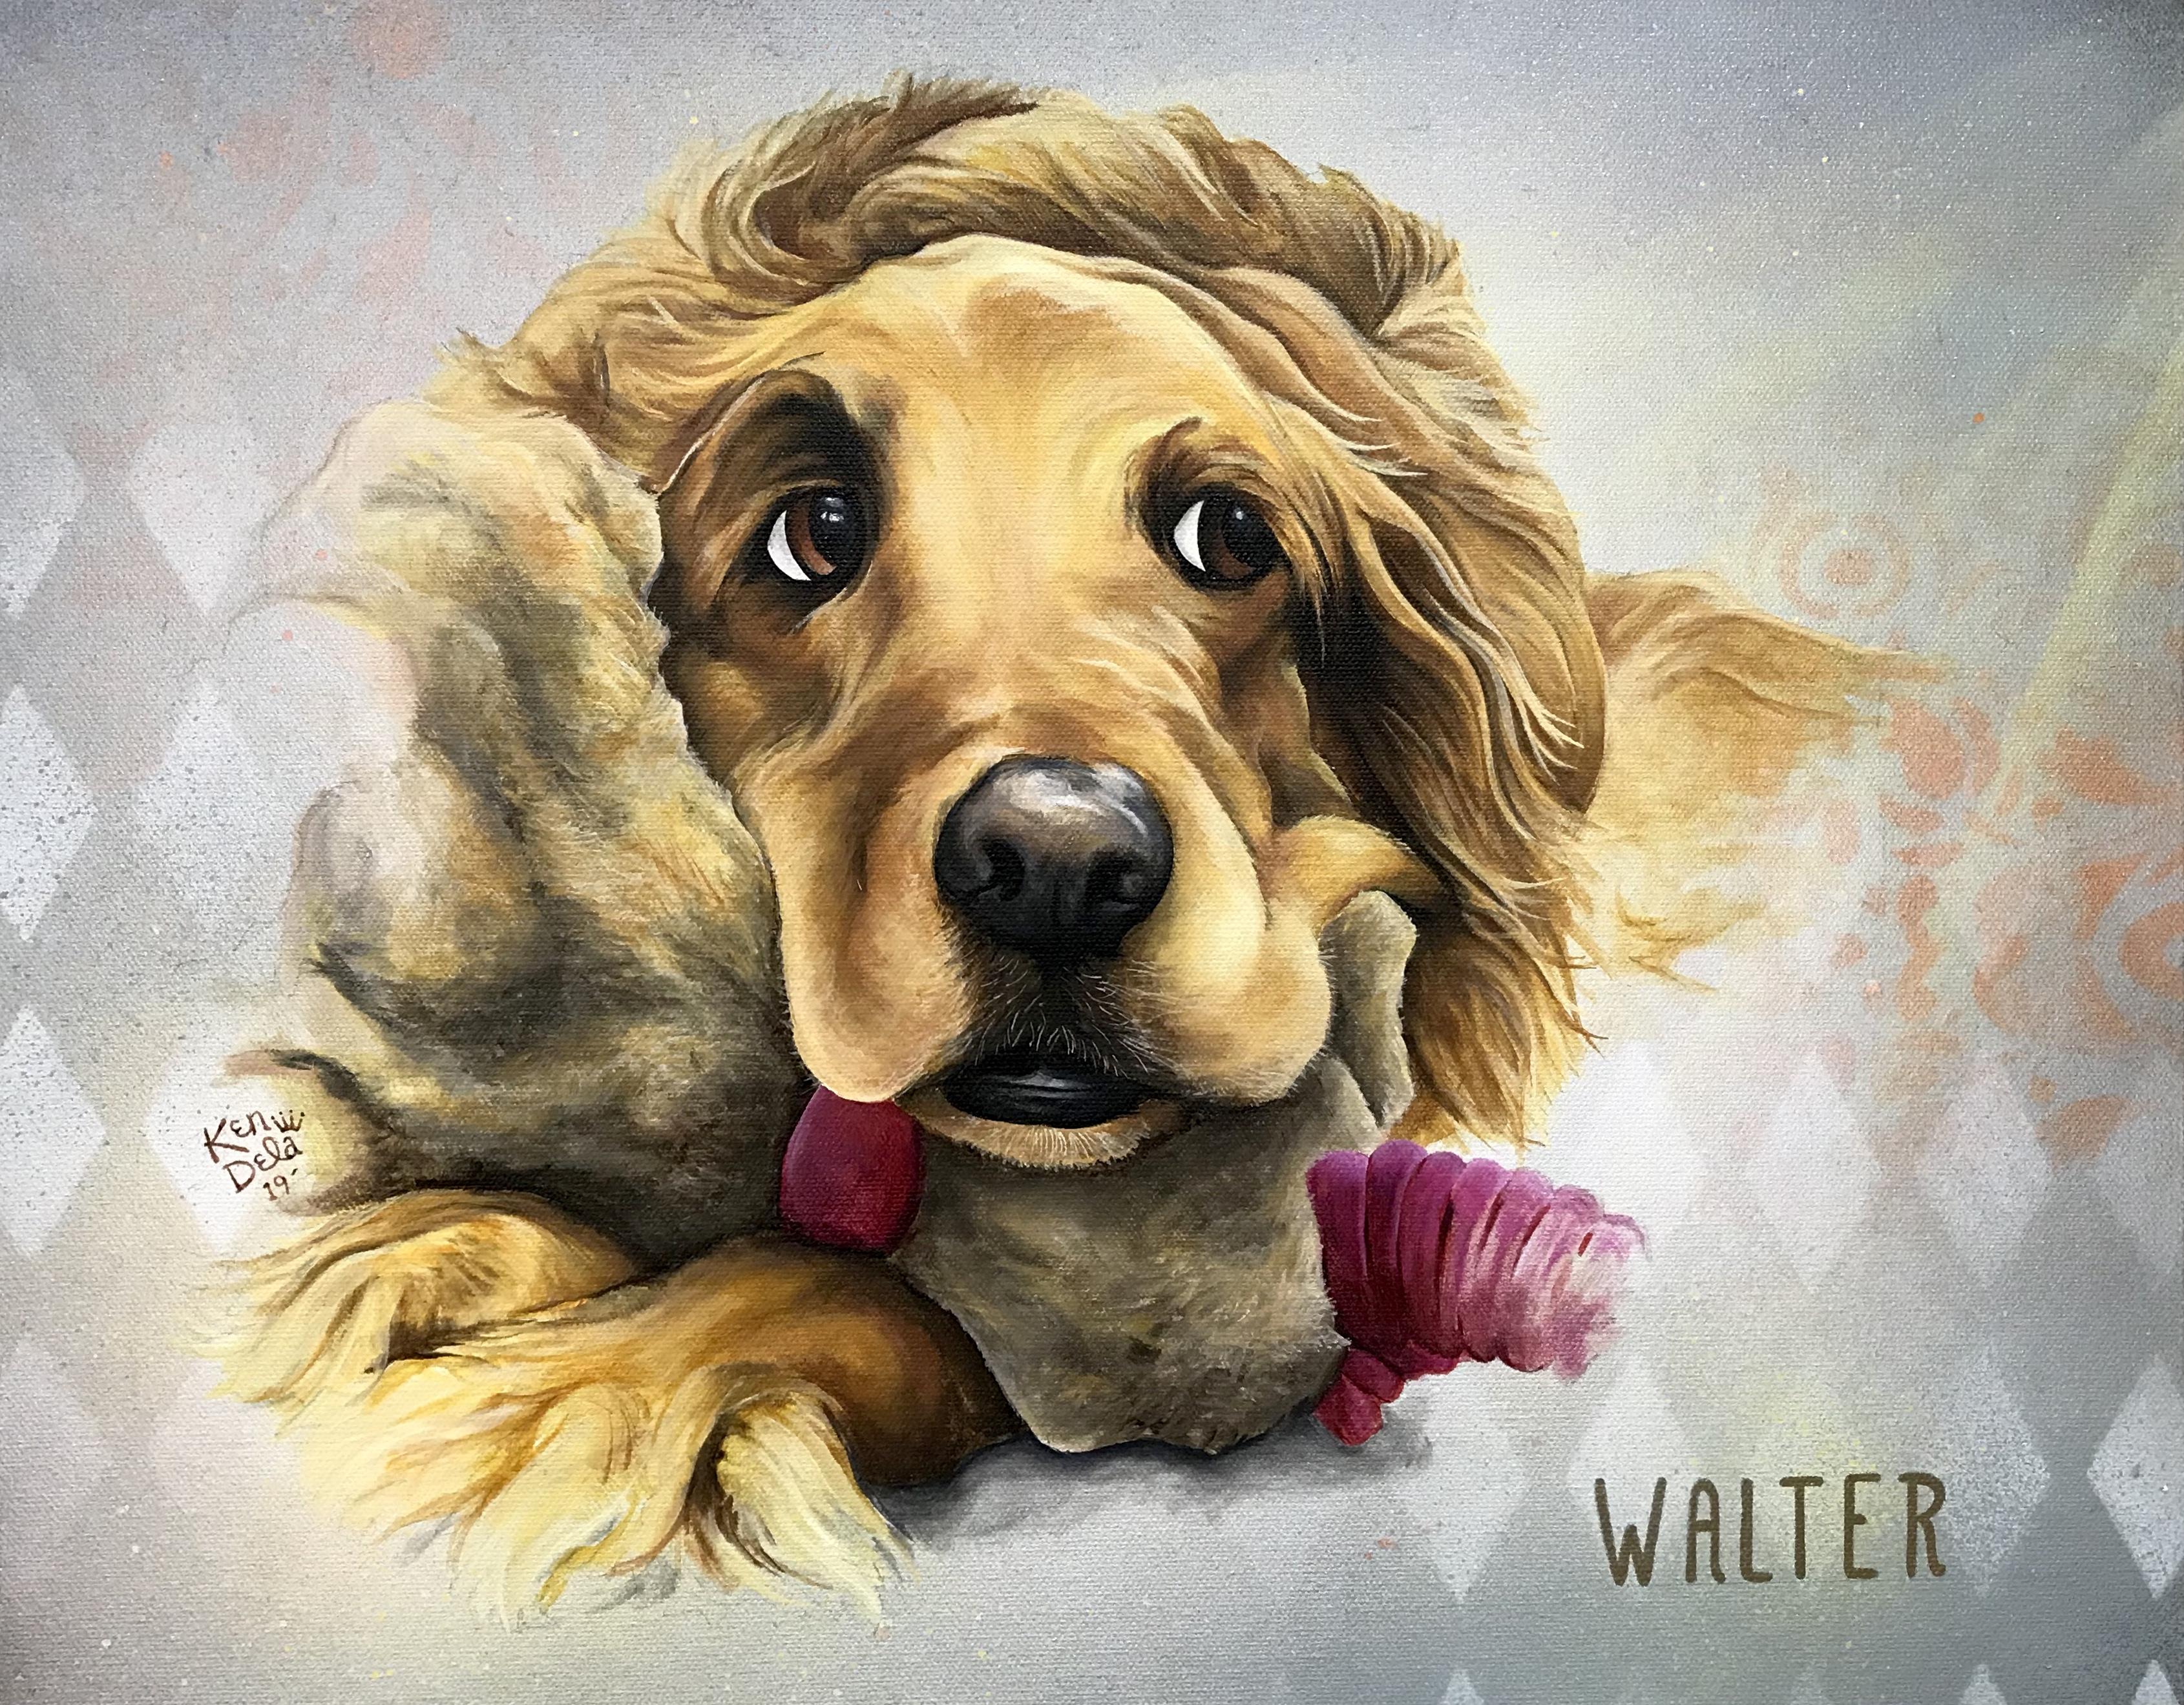 Walter (Four Paws Pantry & Spa)